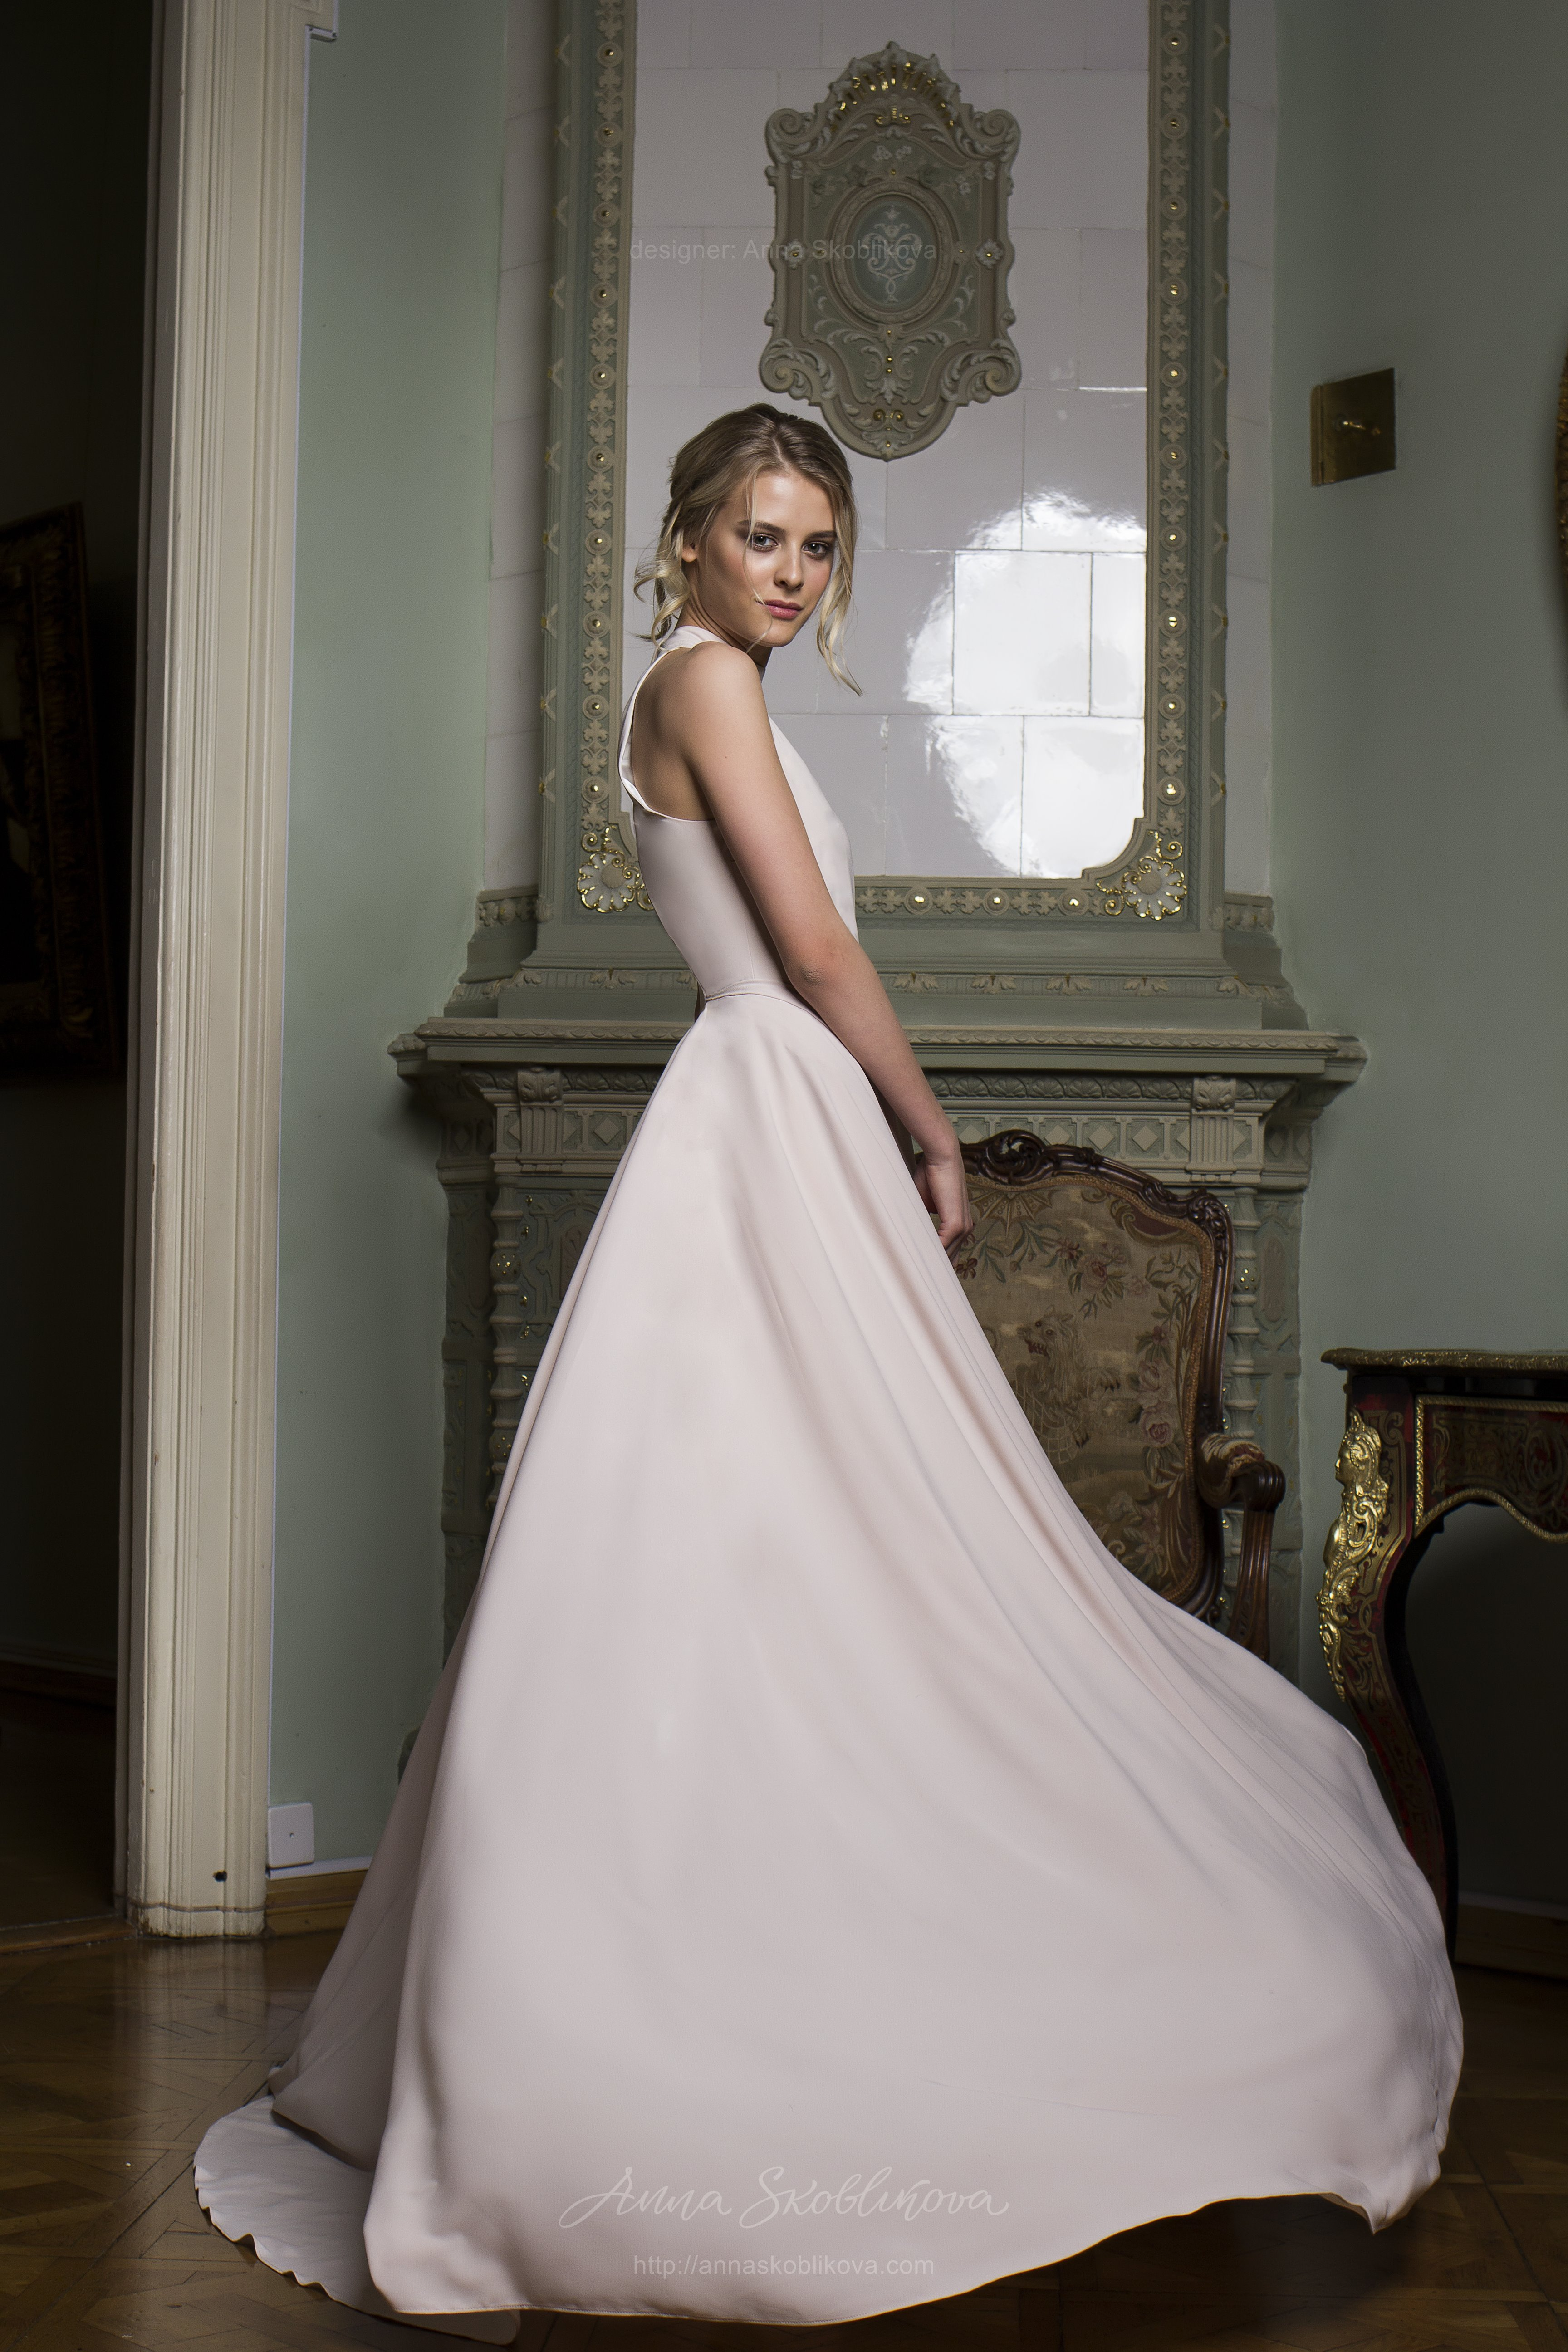 Yunona An Unusual Design Idea Applied In A High Low Wedding Dress